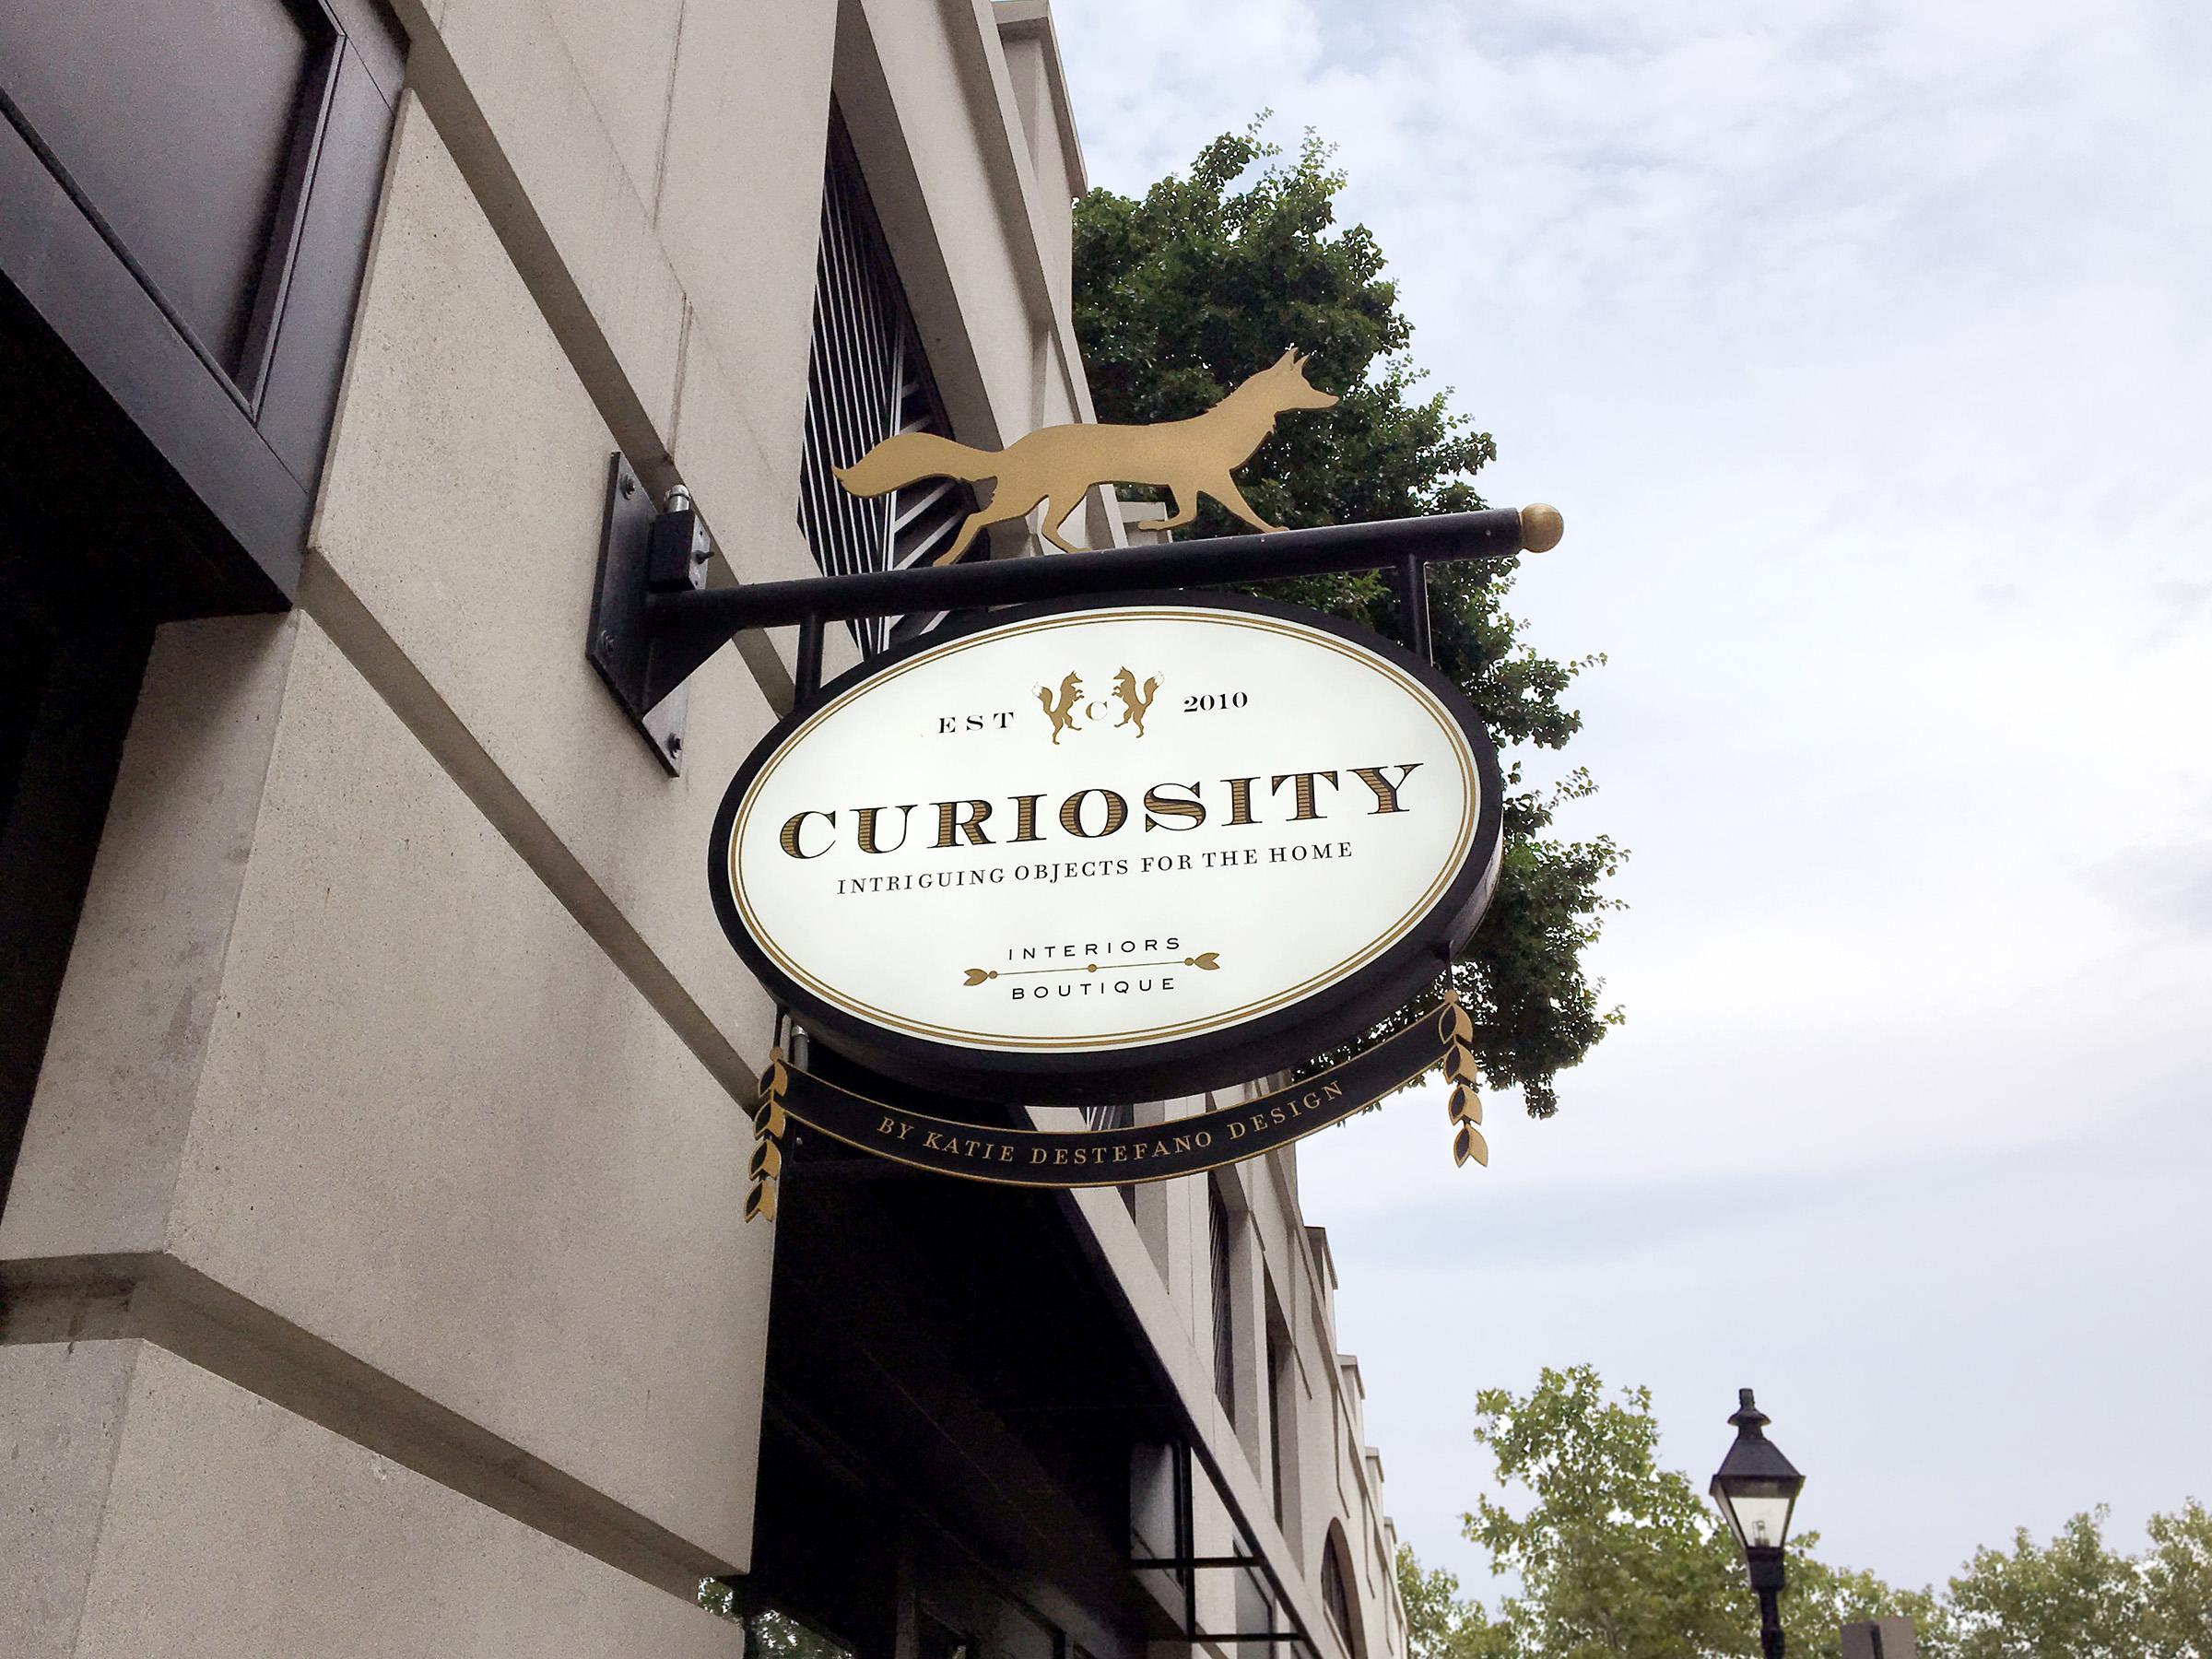 Curiosity: Outdoor Signage